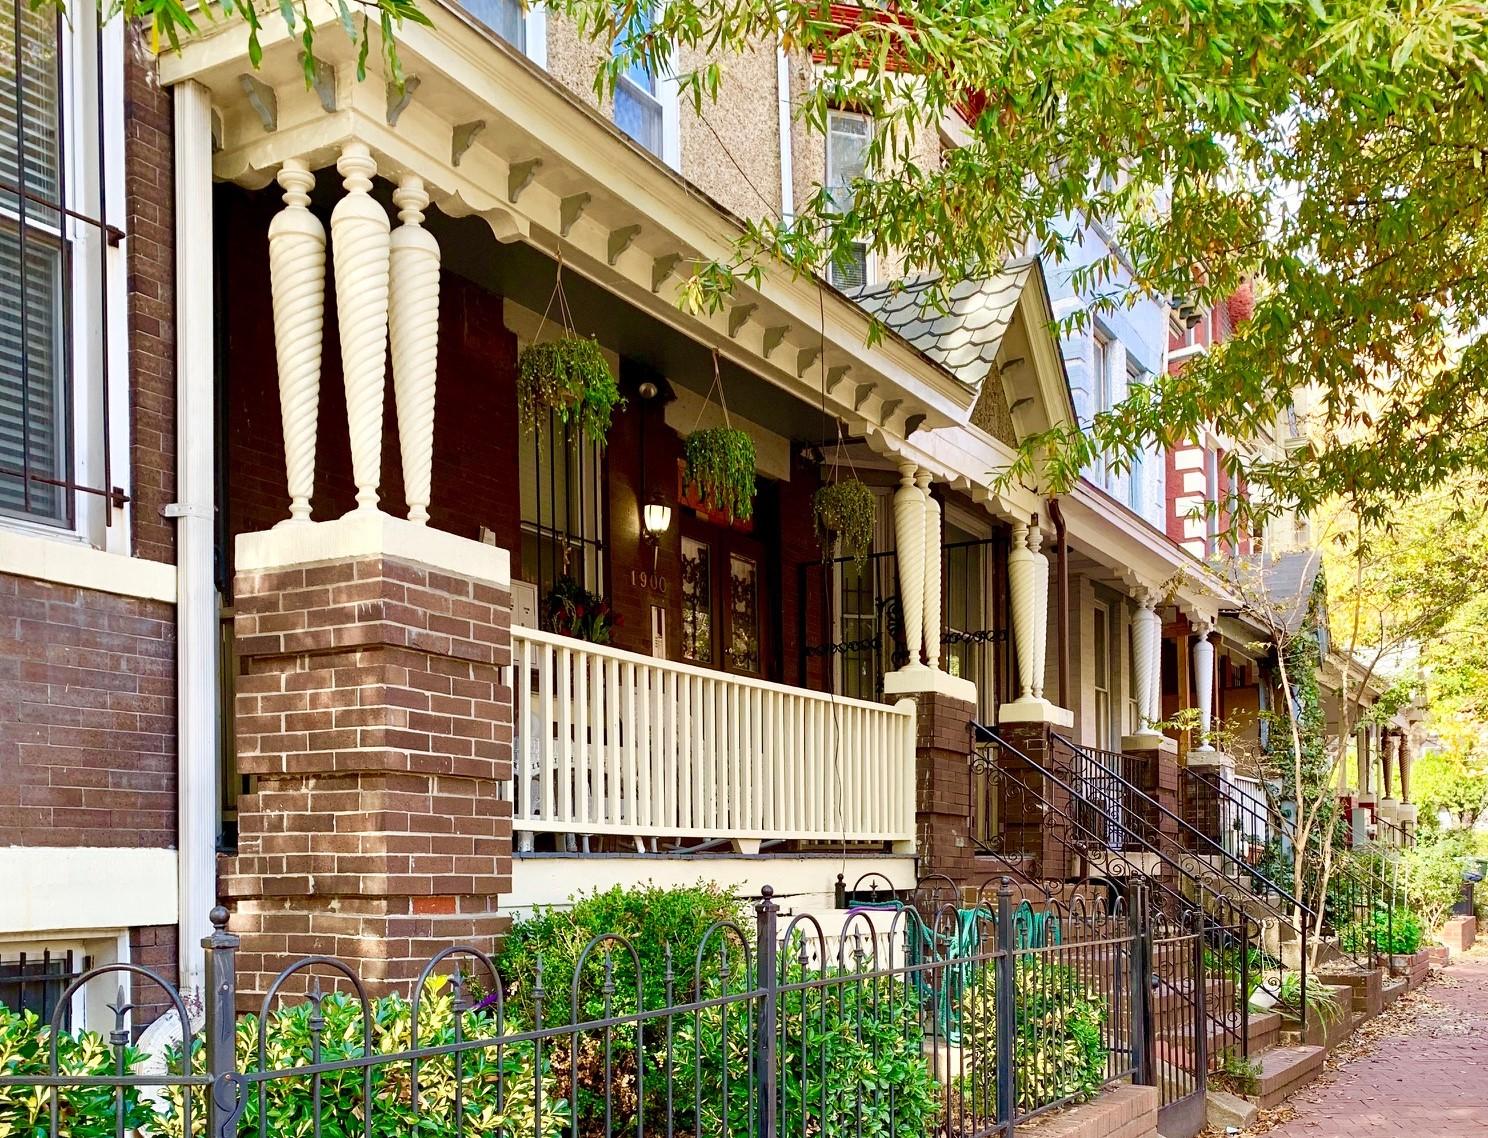 Craftsman Homes in Washington, DC. Anna J Cooper Circle in LeDroit Park